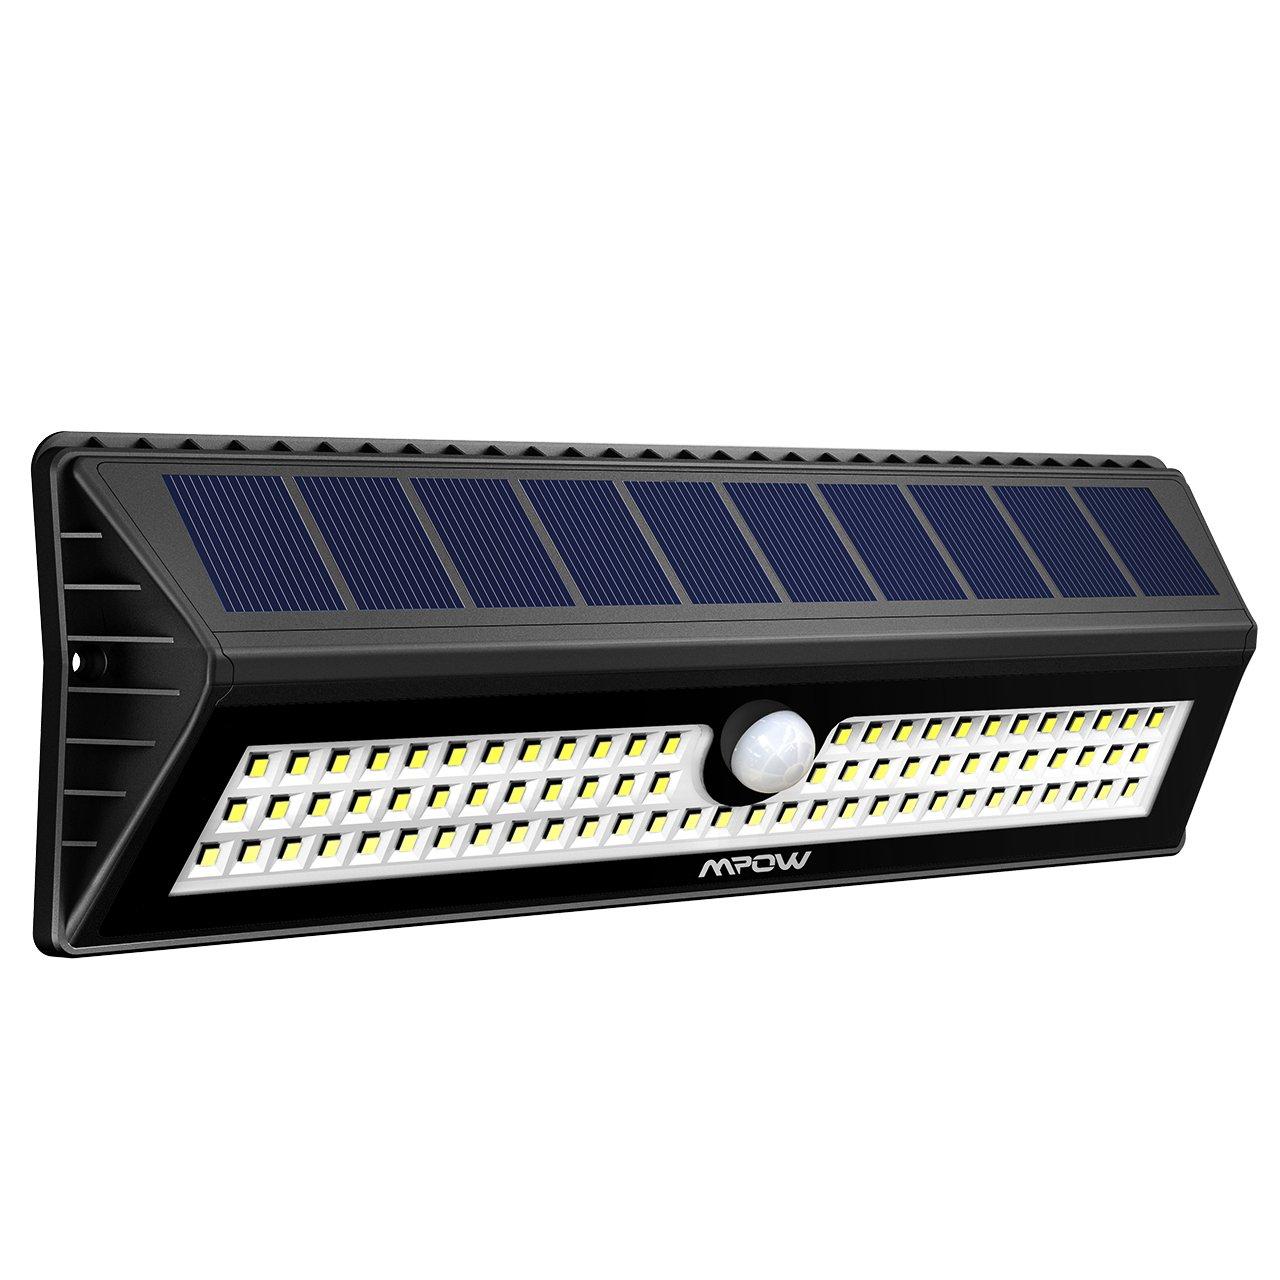 Mpow 77 LED Motion Sensor Solar Light, Bright Wall Light, 3 Optional  Lighting Modes